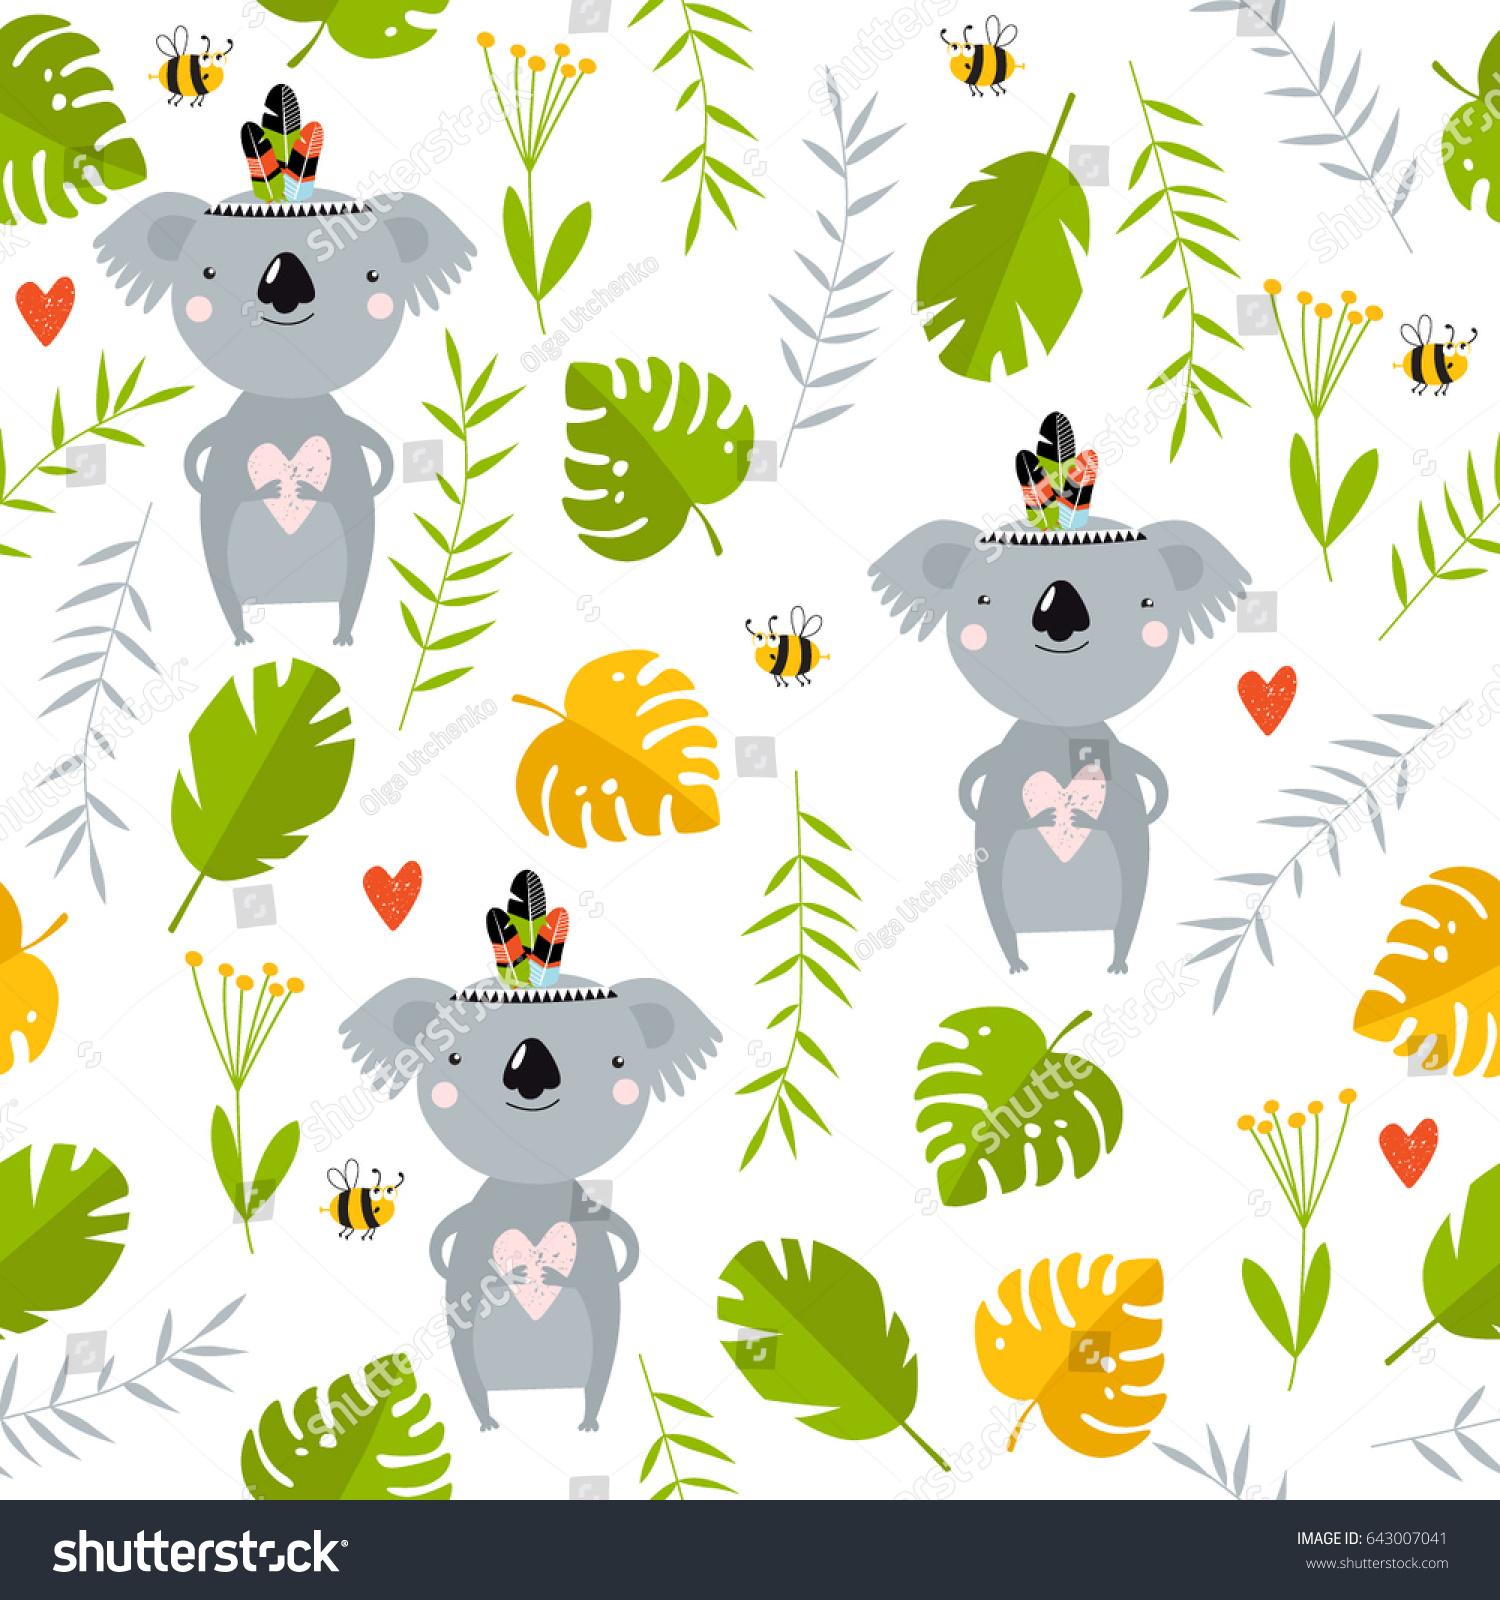 Top Wallpaper Koala Cartoon - stock-vector-vector-tropical-background-with-koalas-australia-cartoon-koalas-koala-is-holding-a-heart-643007041  Best Photo Reference_775832   .jpg